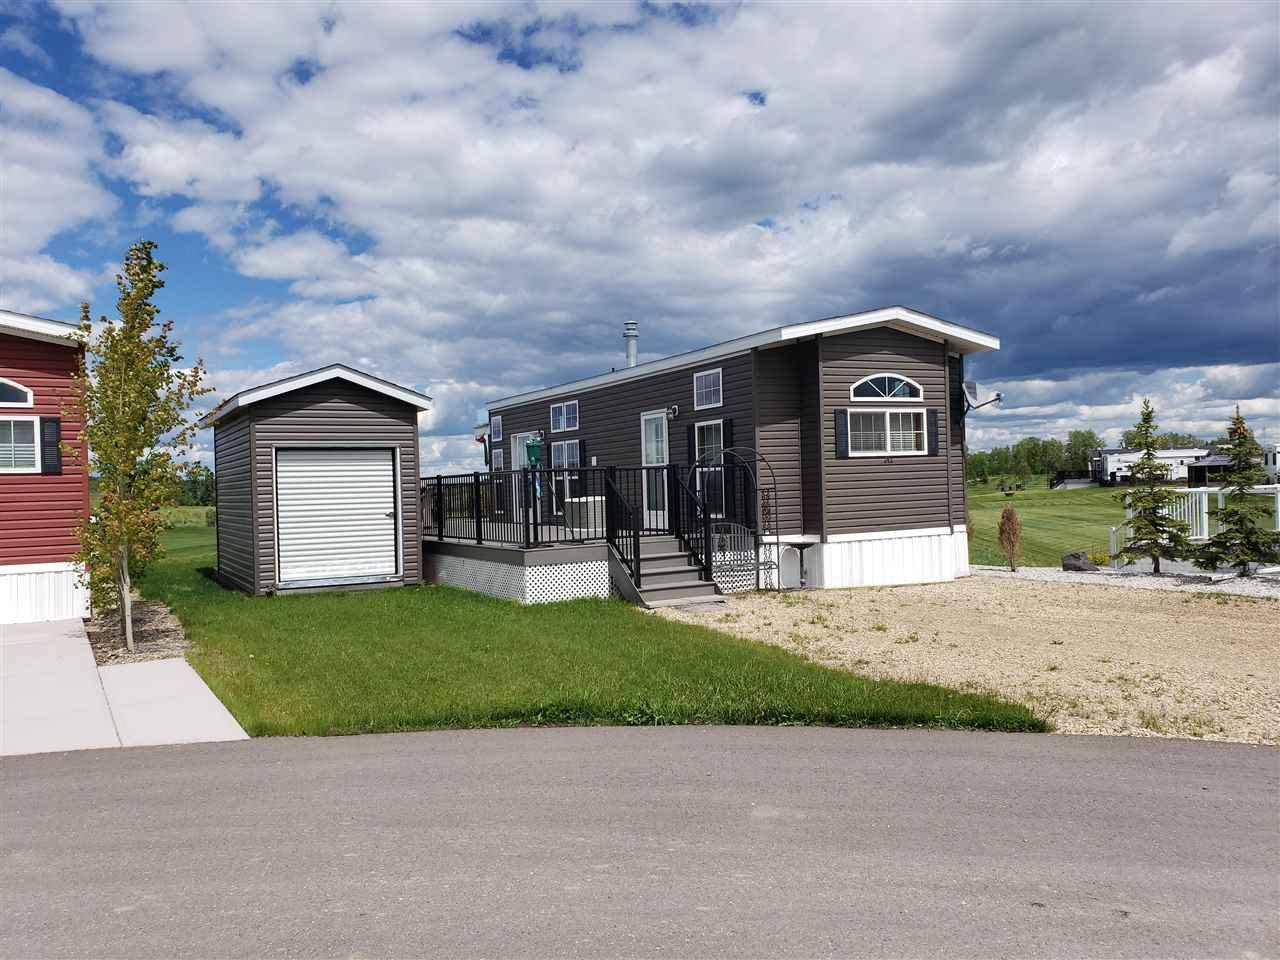 Main Photo: 242 53126 RANGE ROAD 70: Rural Parkland County House for sale : MLS®# E4175096